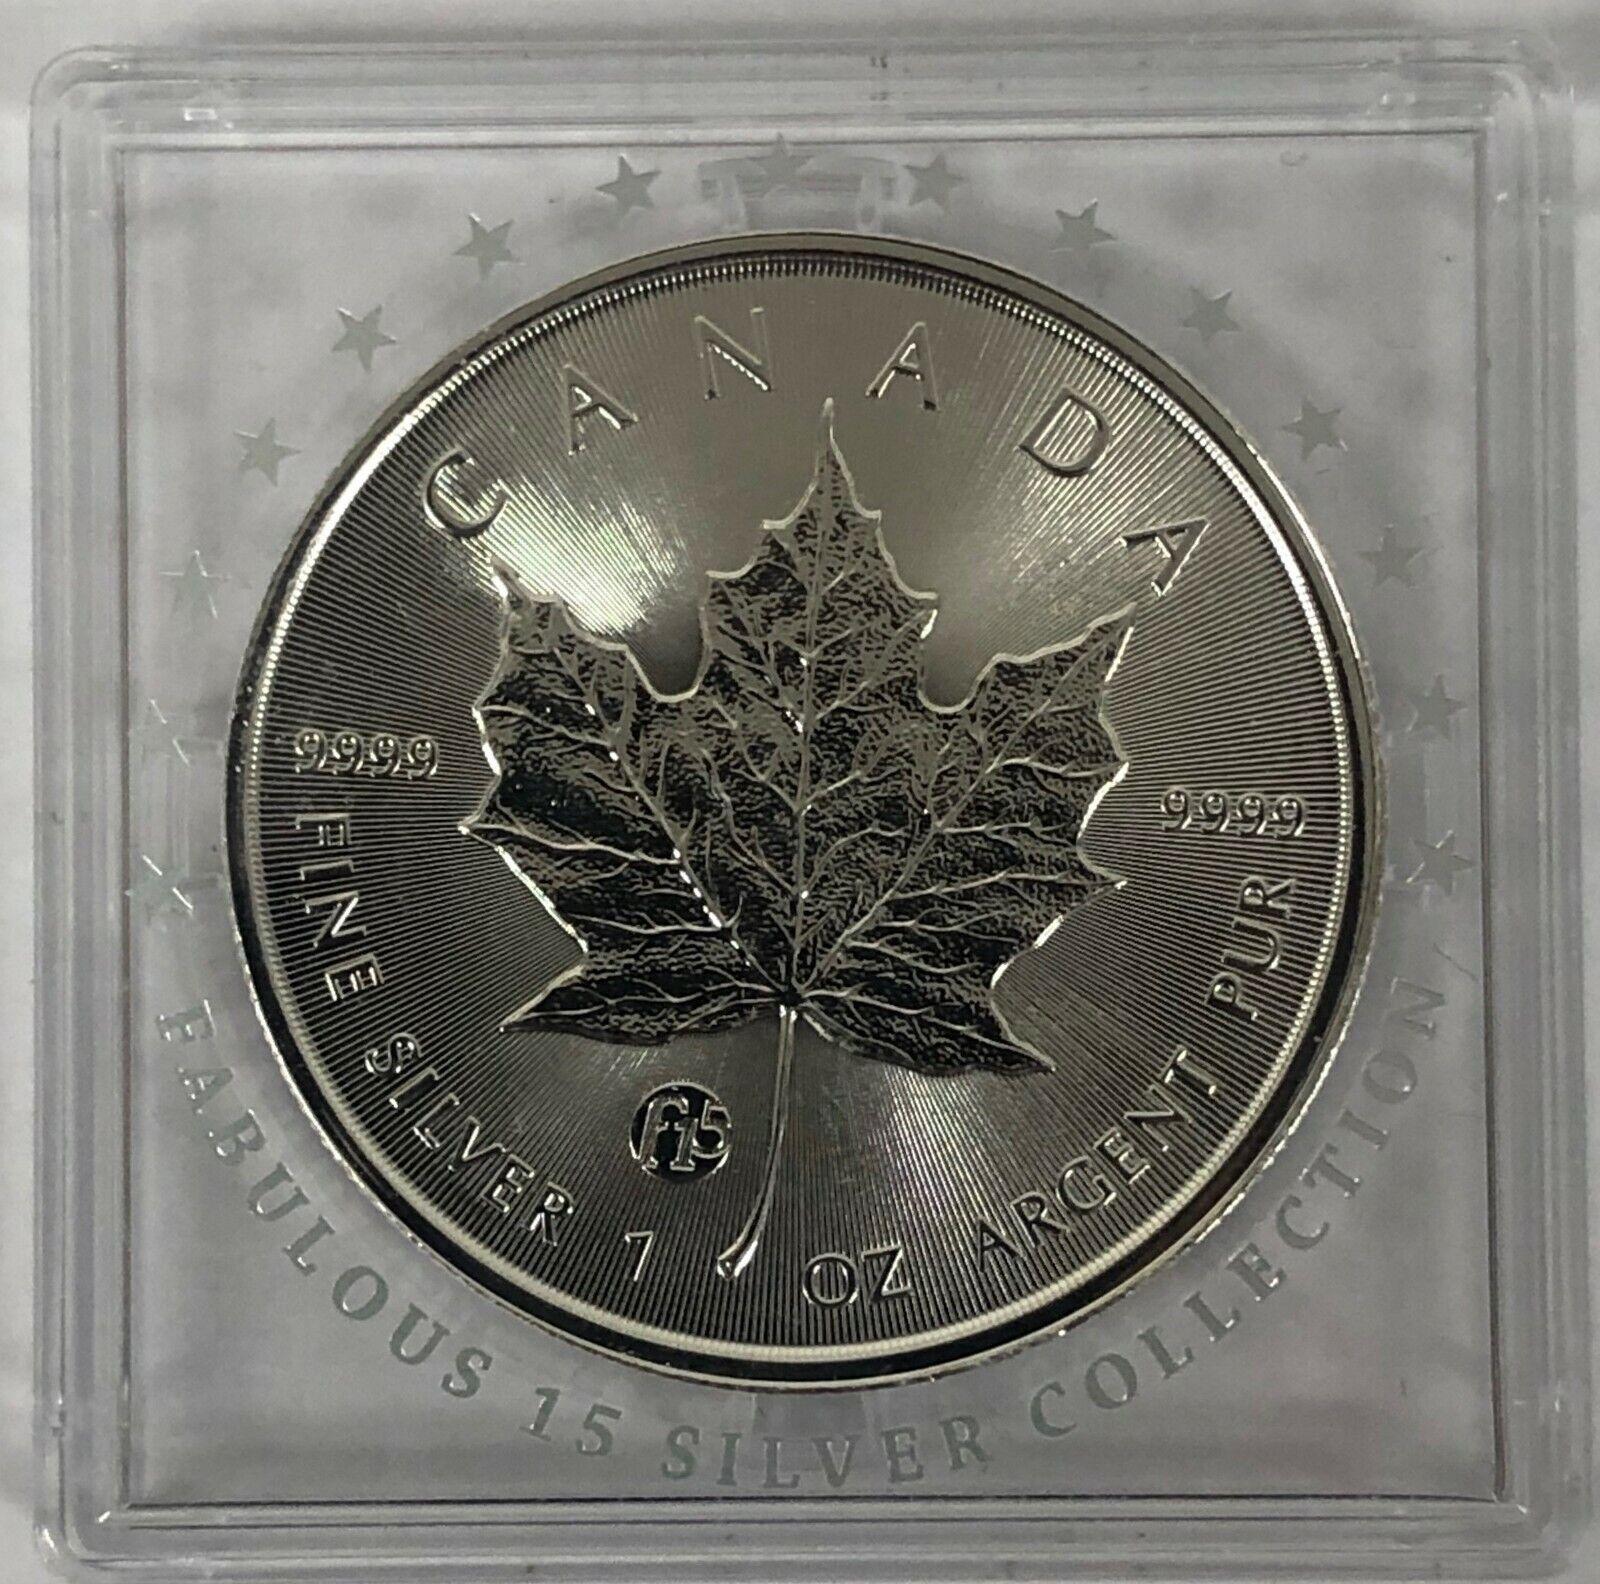 RWANDA CHEETAH 2013 1 oz Silver Coin African Wildlife Fabulous 15 F15 PRIVY MARK